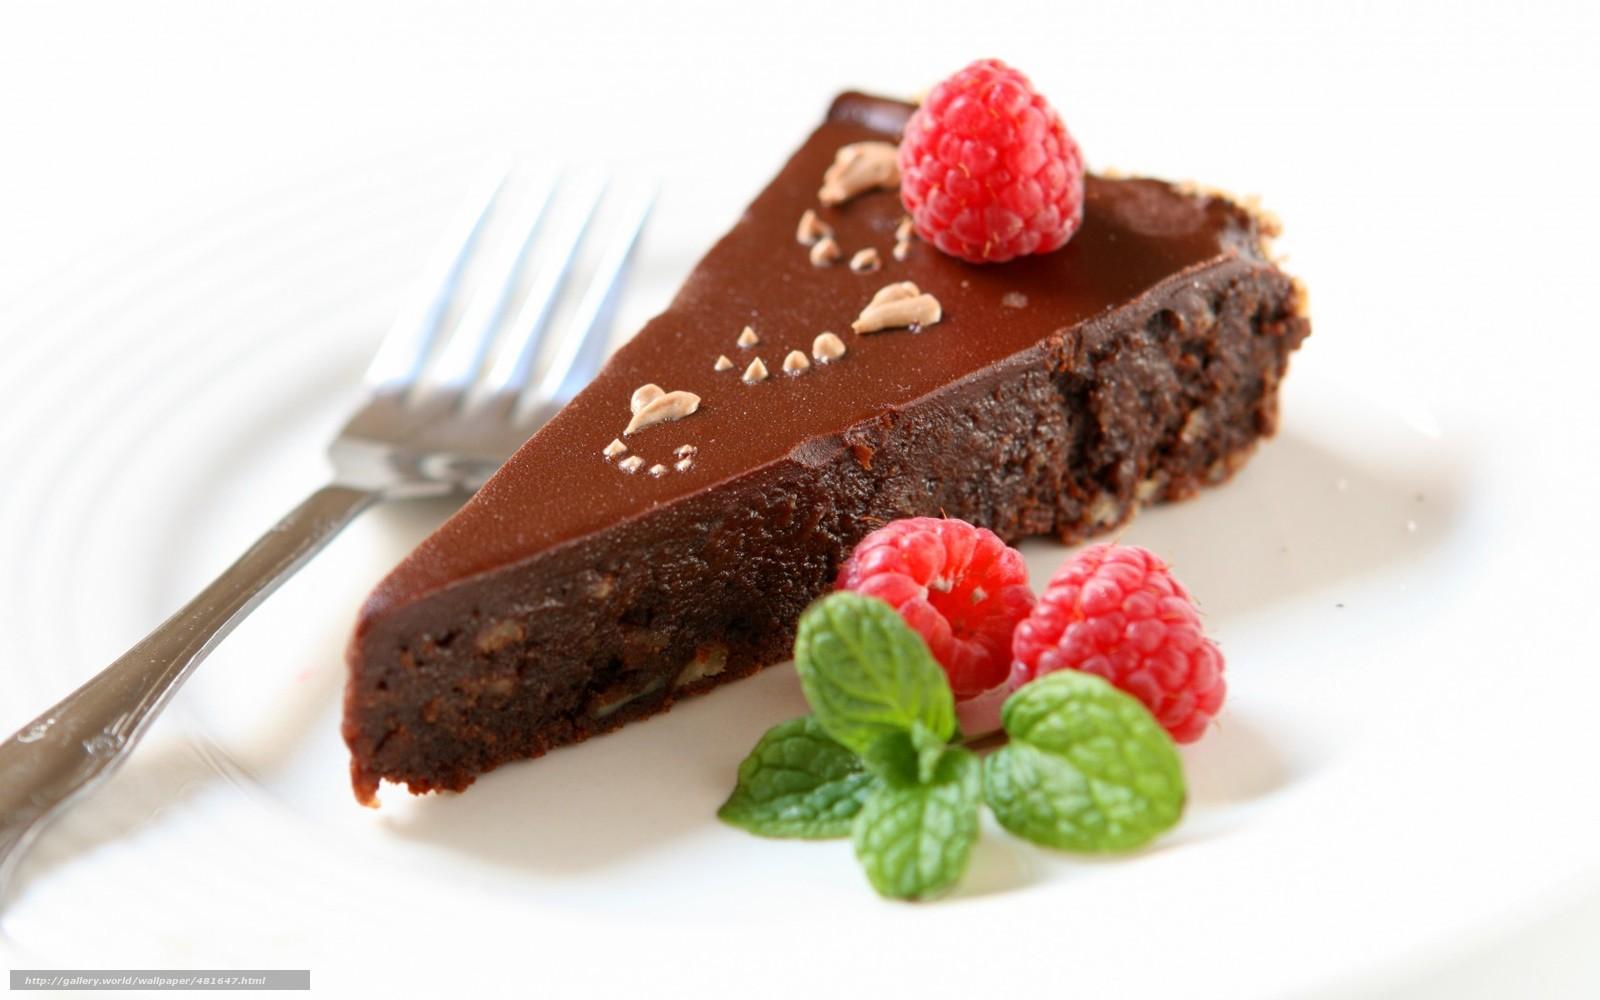 Download wallpaper fork,  cake,  raspberry,  Berries free desktop wallpaper in the resolution 1680x1050 — picture №481647